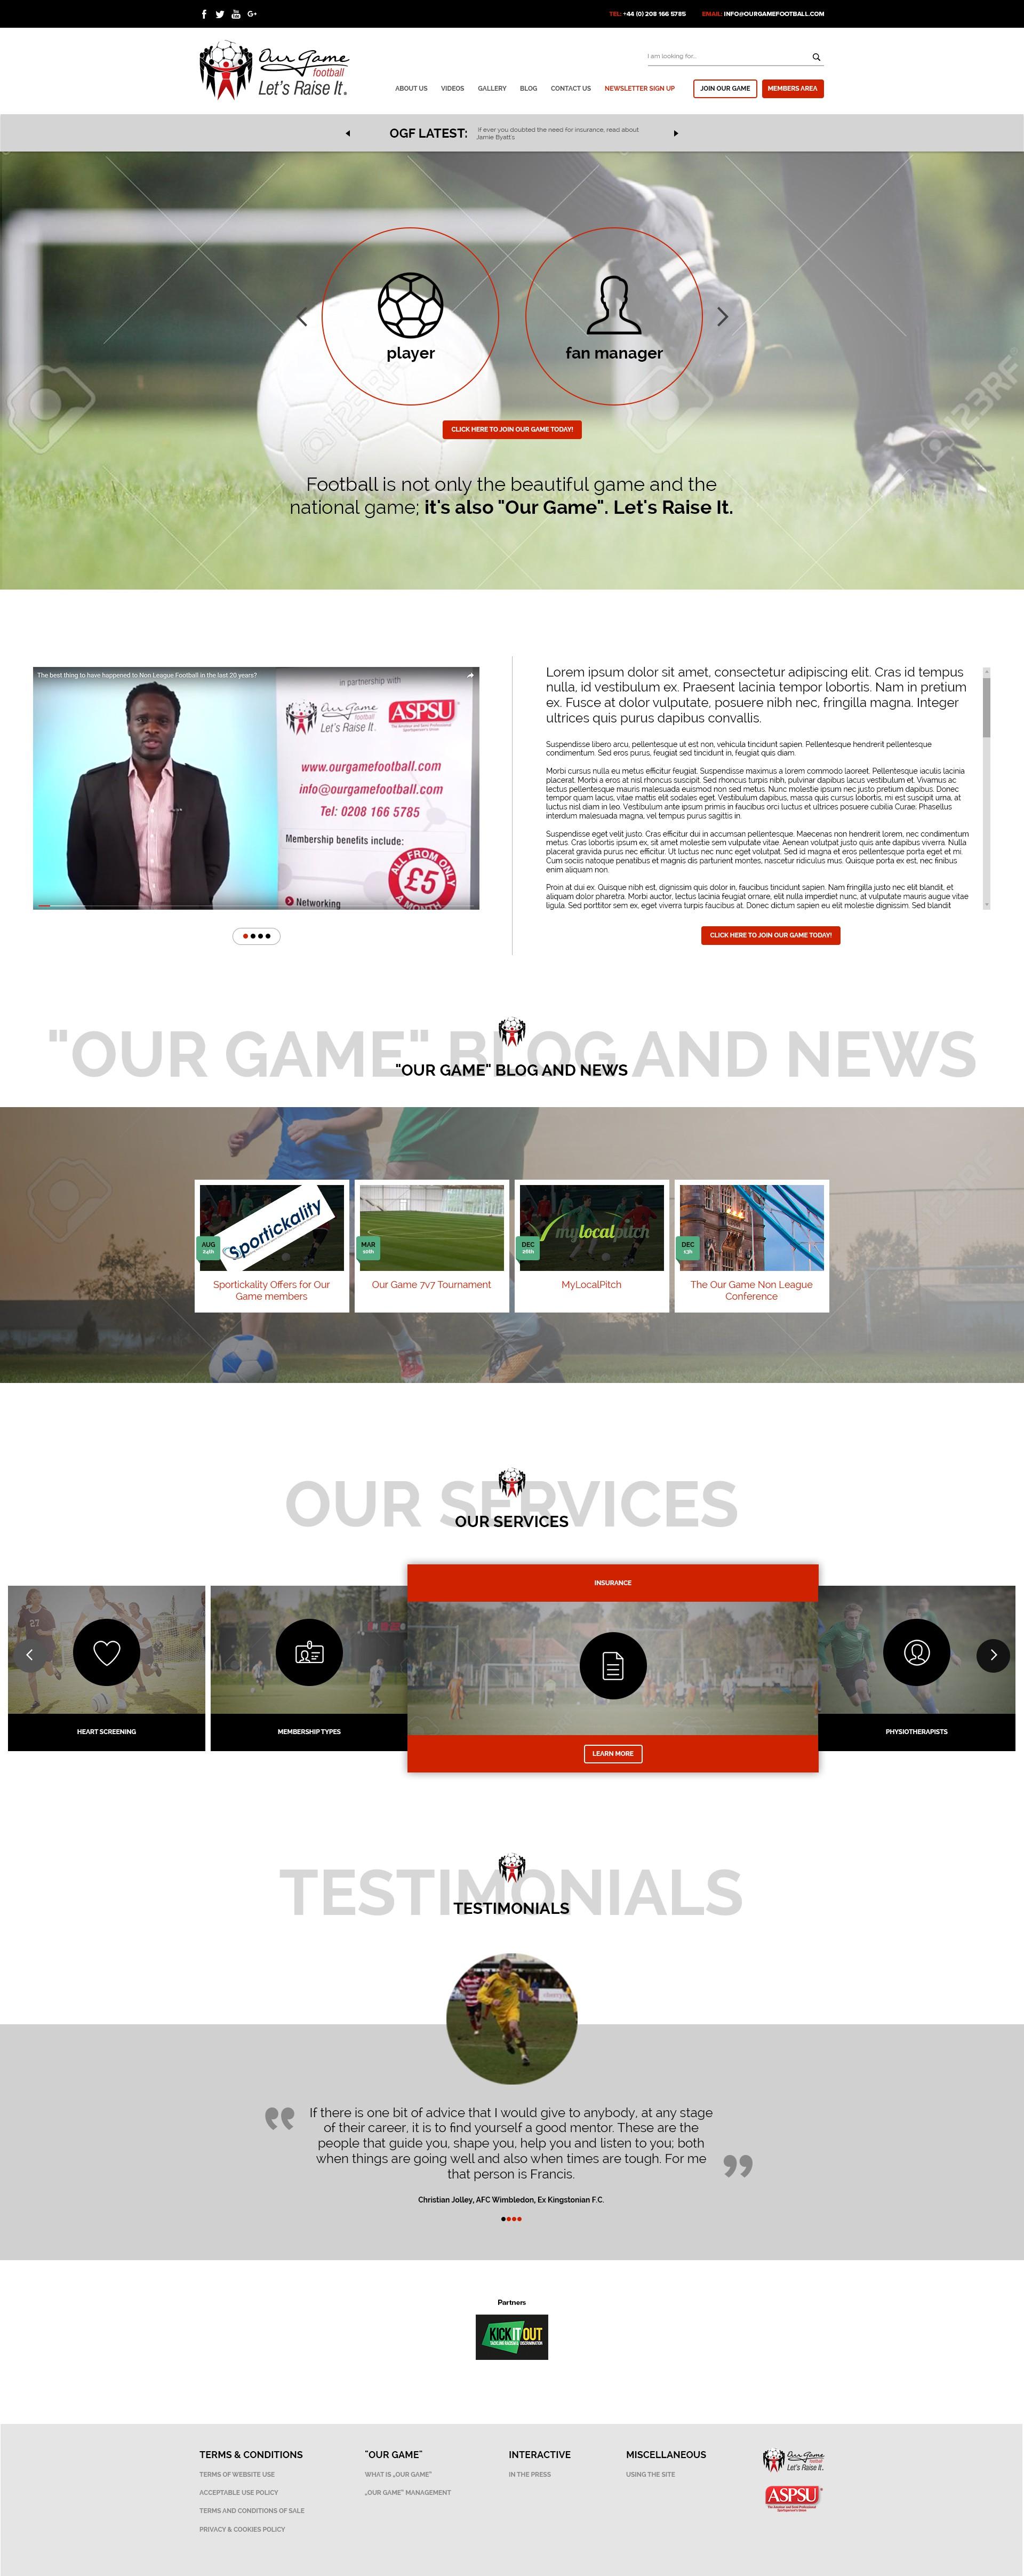 Redesign for footballers' network website